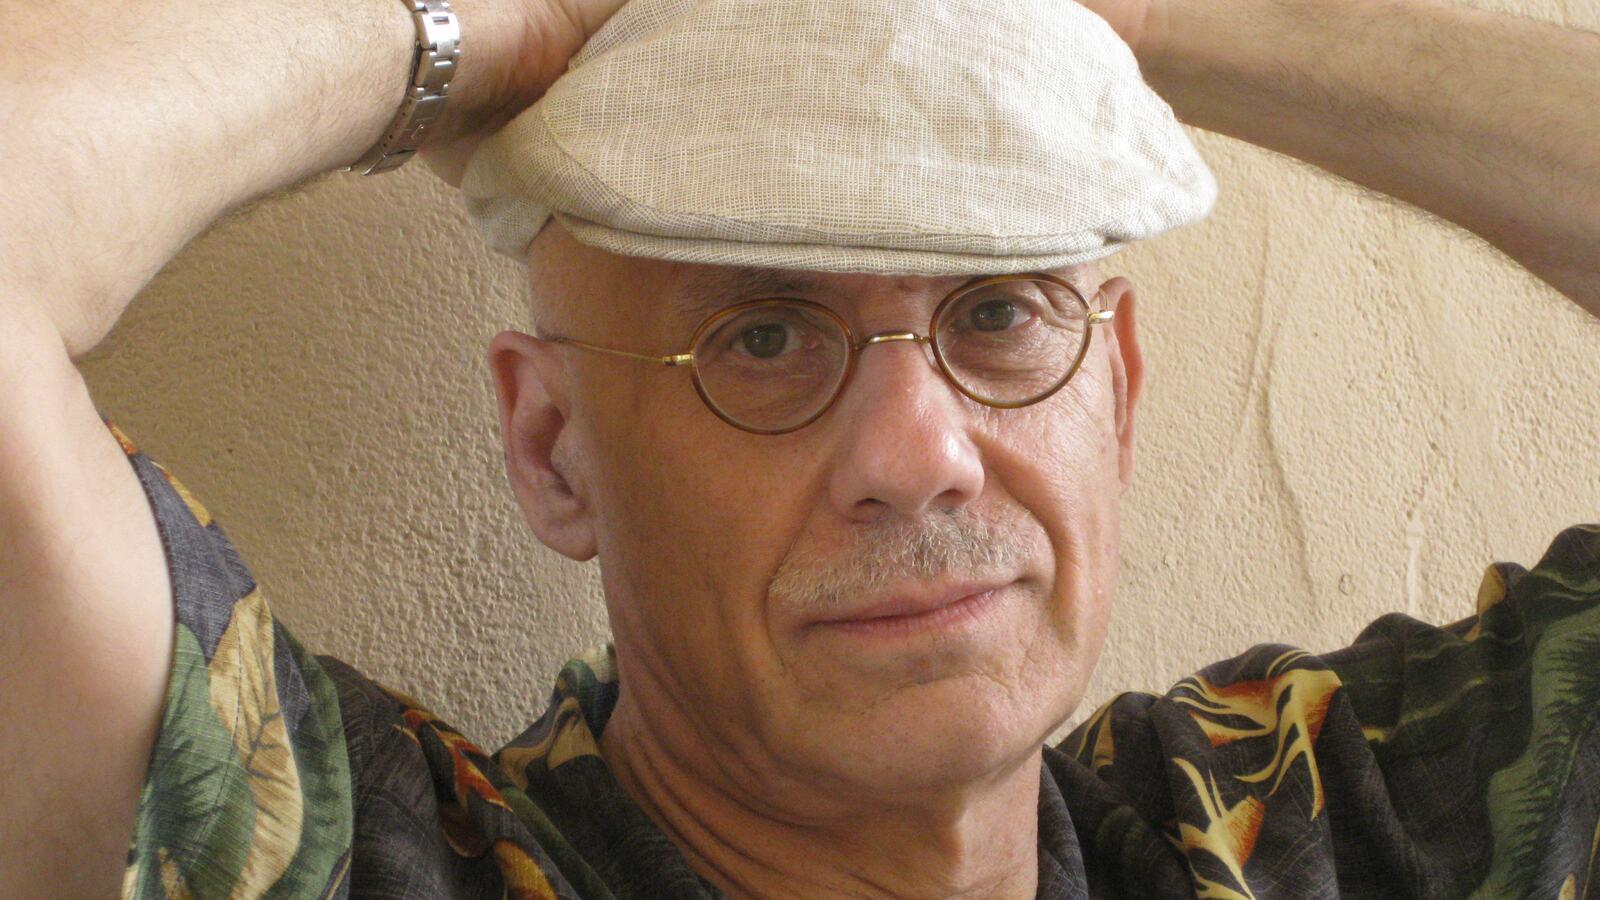 Headshot of James Ellroy, American crime writer